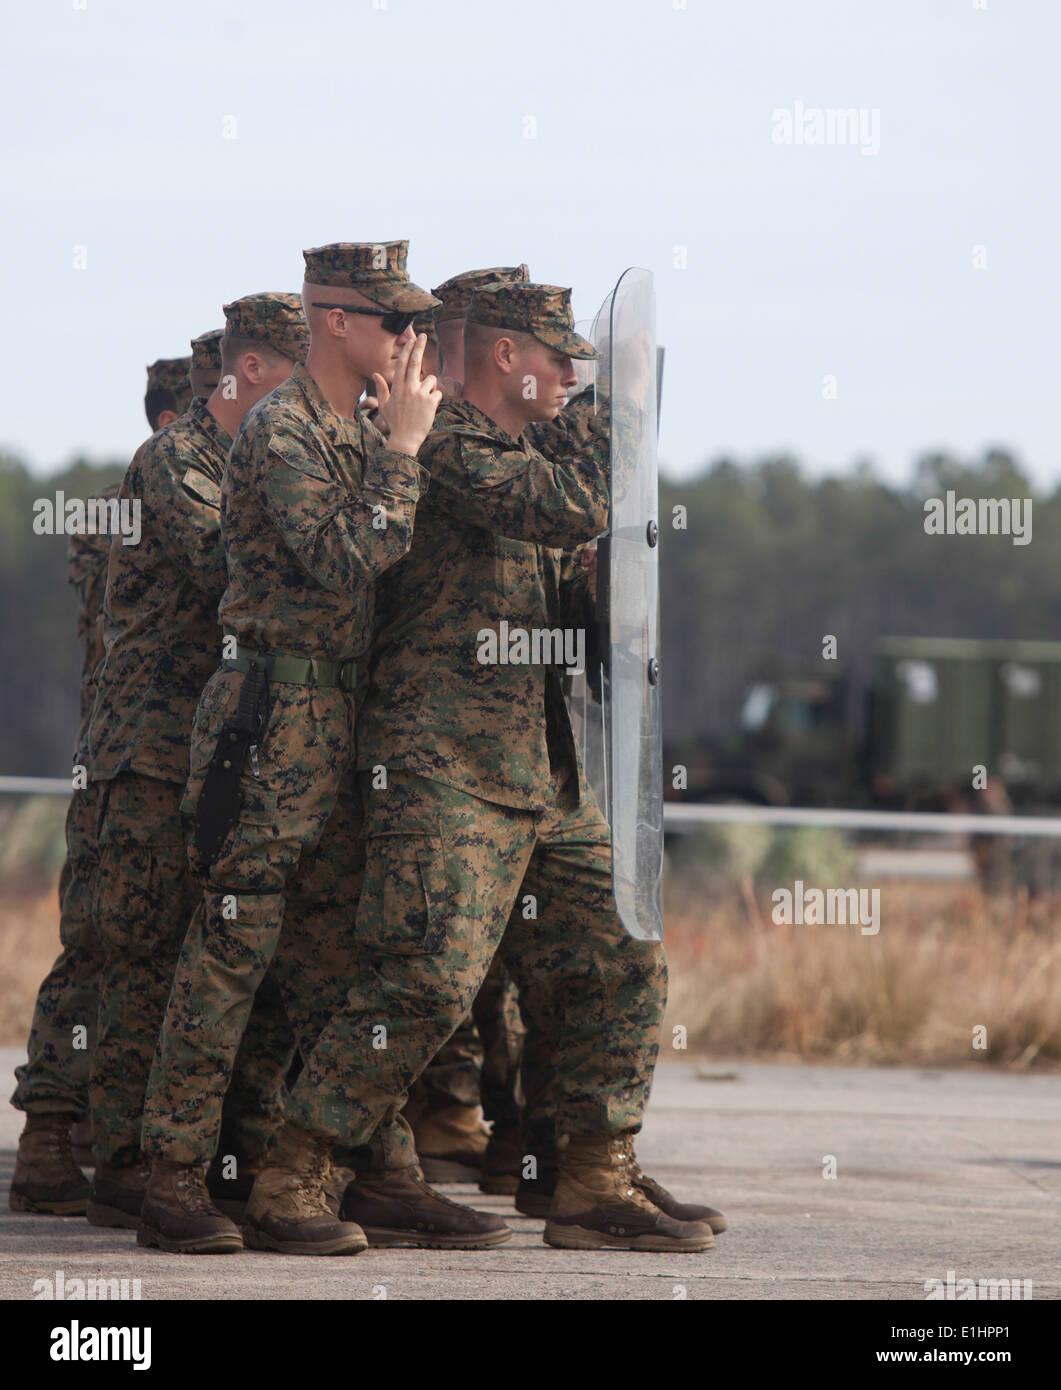 U.S. Marines and sailors assigned to Black Sea Rotational Force-13 (BSRF-13) conduct civil disturbance/riot control drills duri - Stock Image